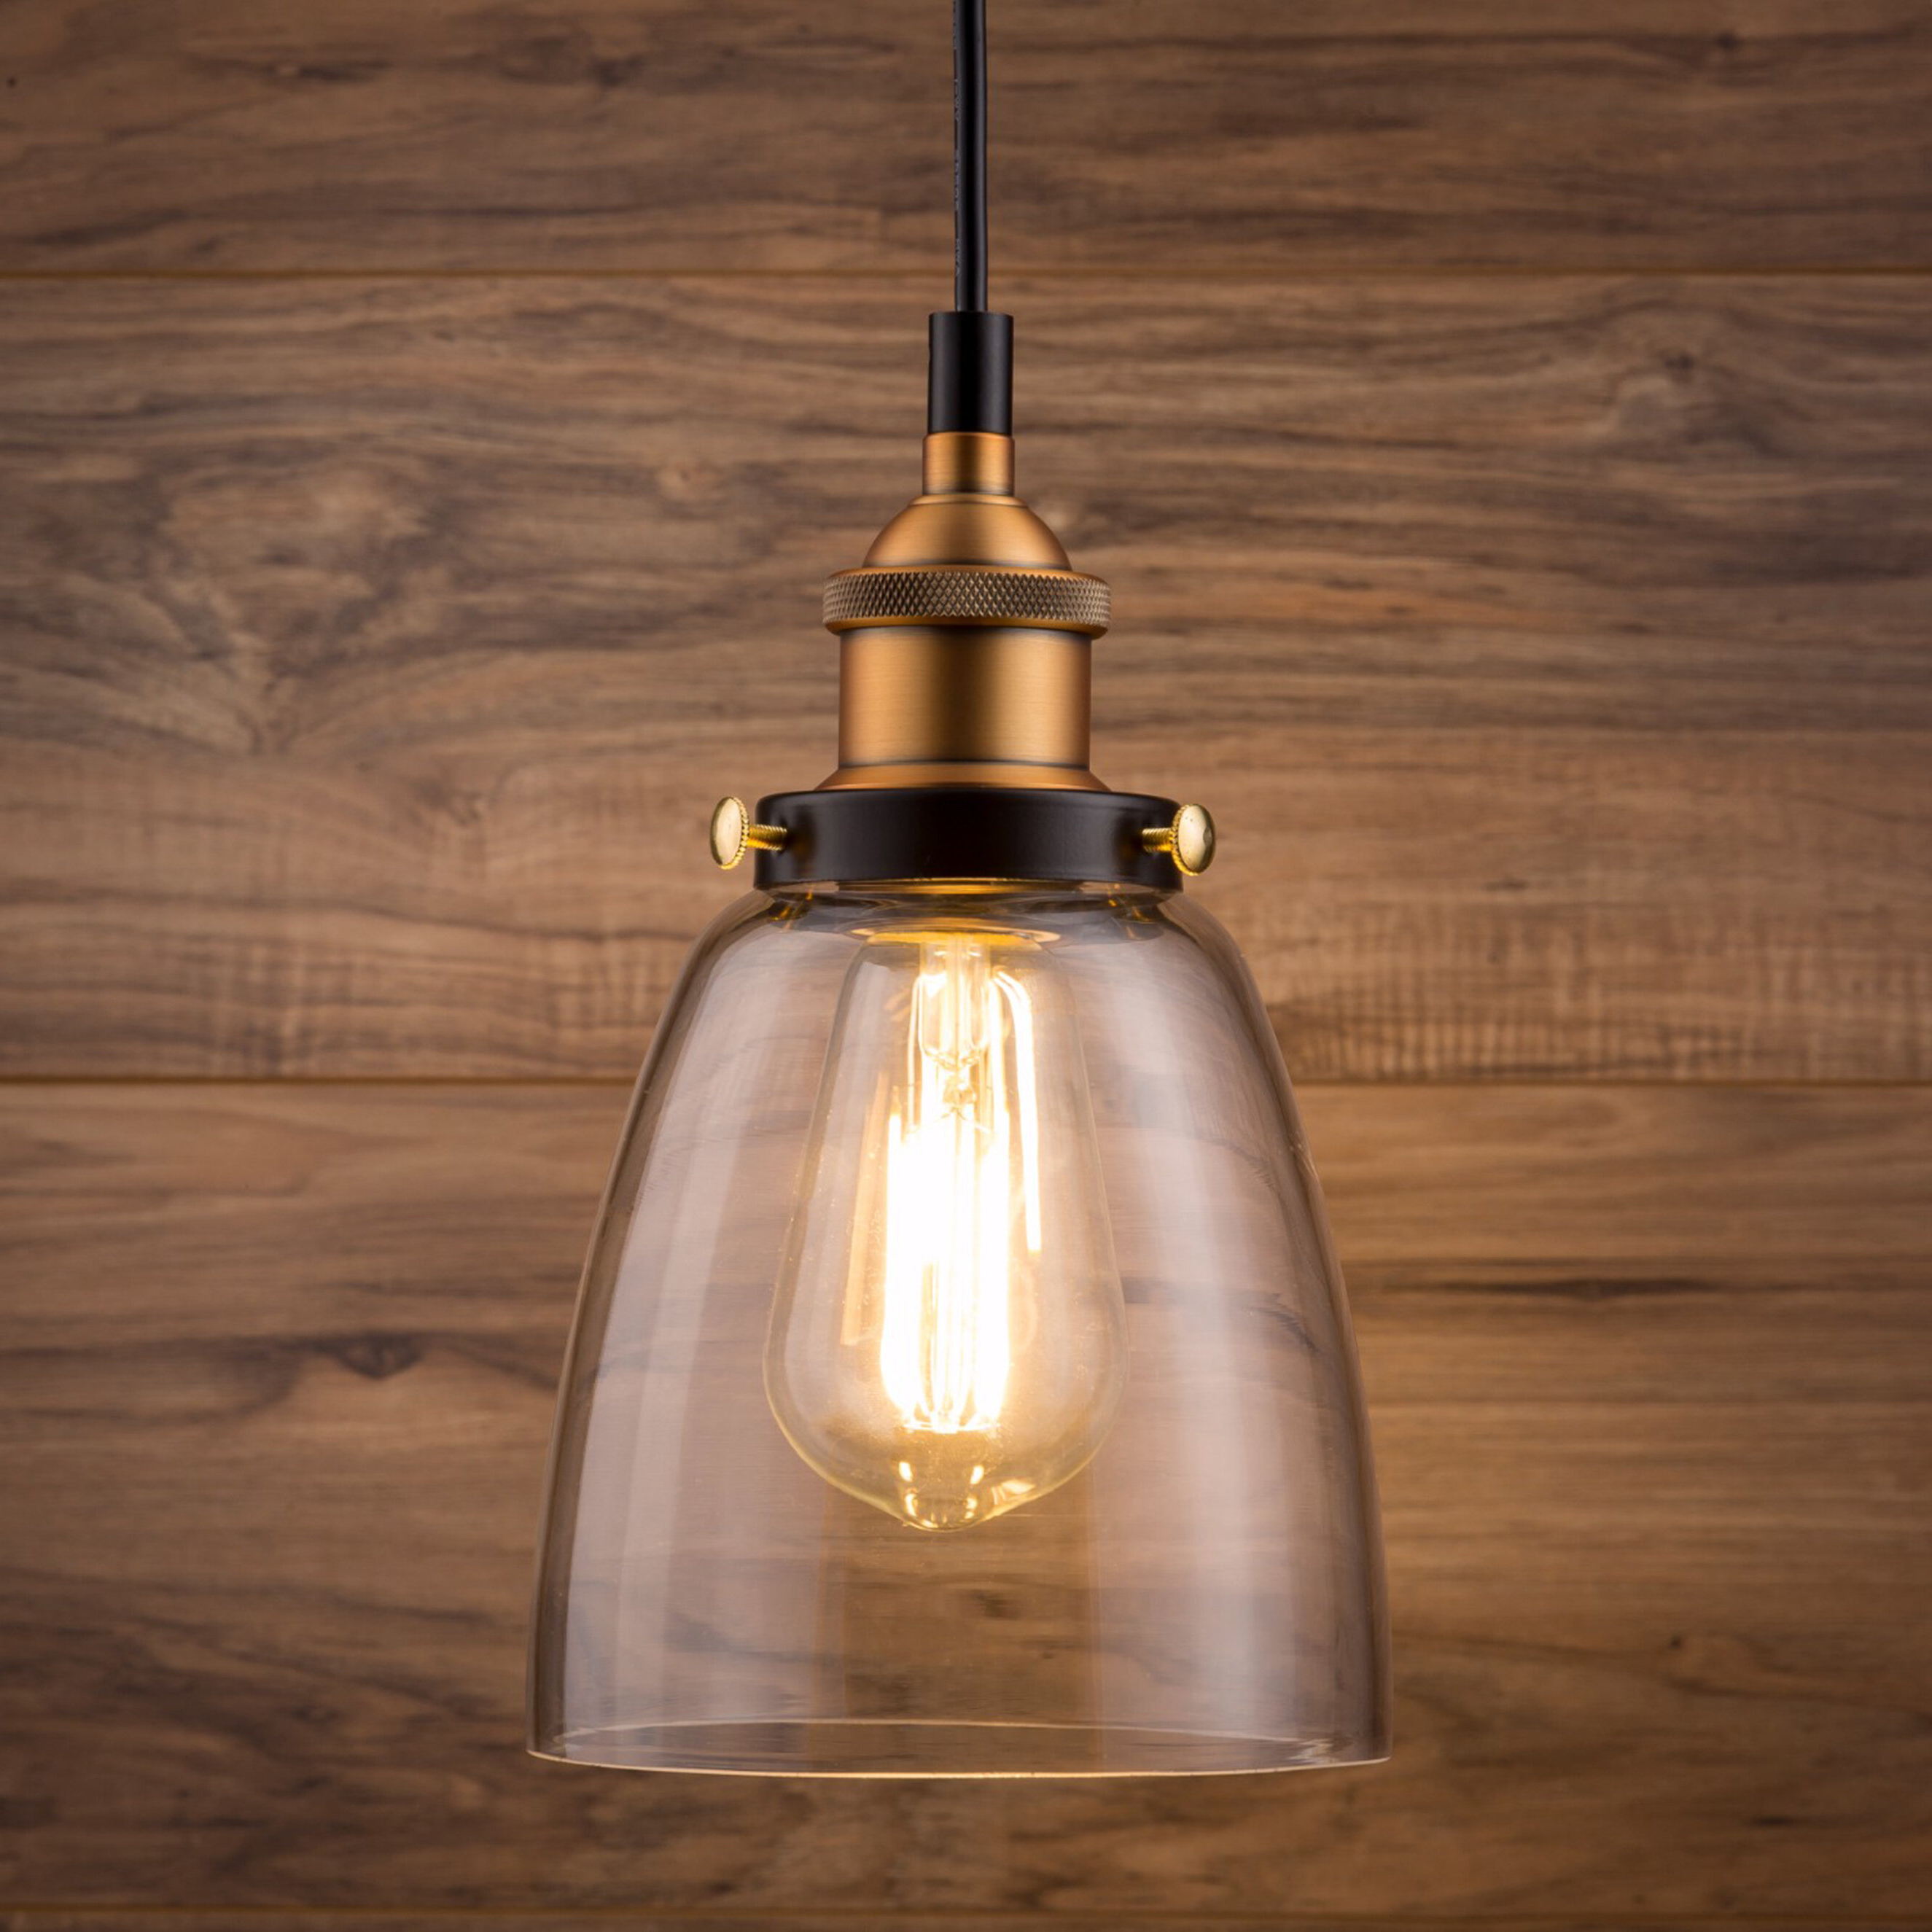 1 Light Single Bell Pendants In Well Known Bundaberg 1 Light Single Bell Pendant (Gallery 11 of 20)